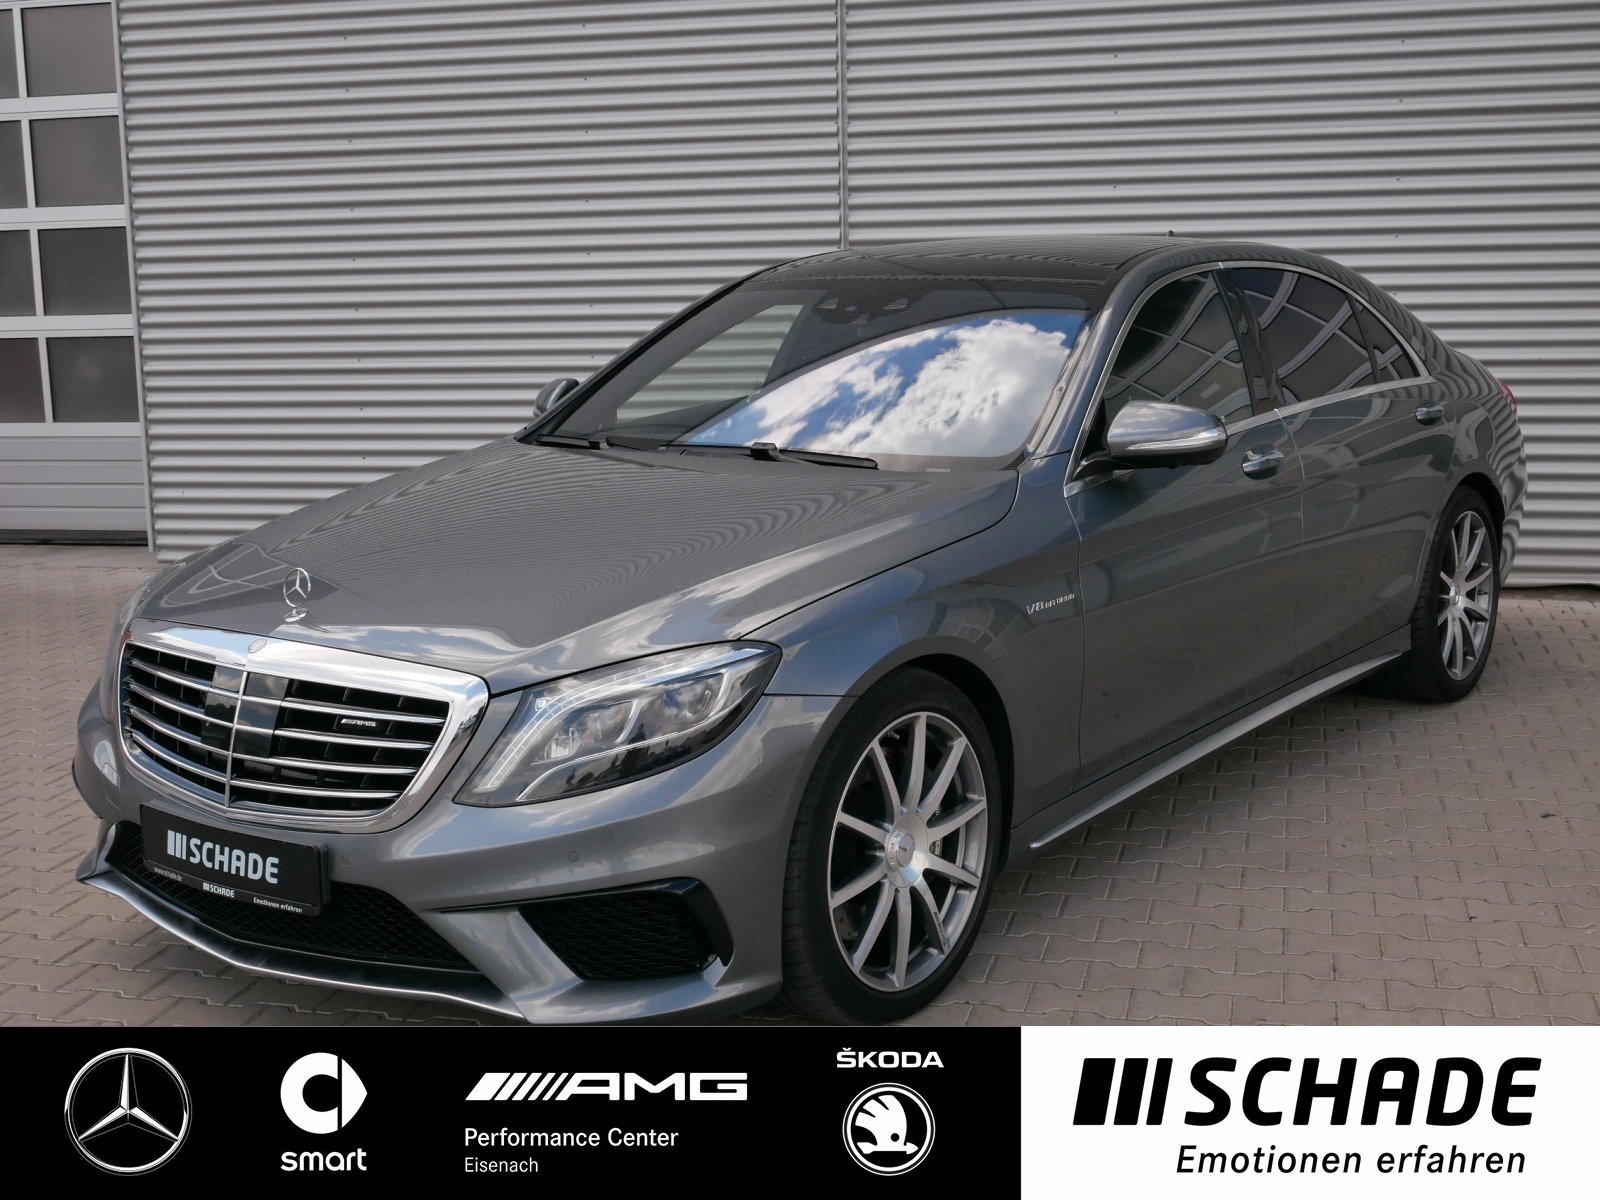 Mercedes-Benz S 63 4M lang Neupreis 215675*Standhzg*Burmester, Jahr 2016, Benzin